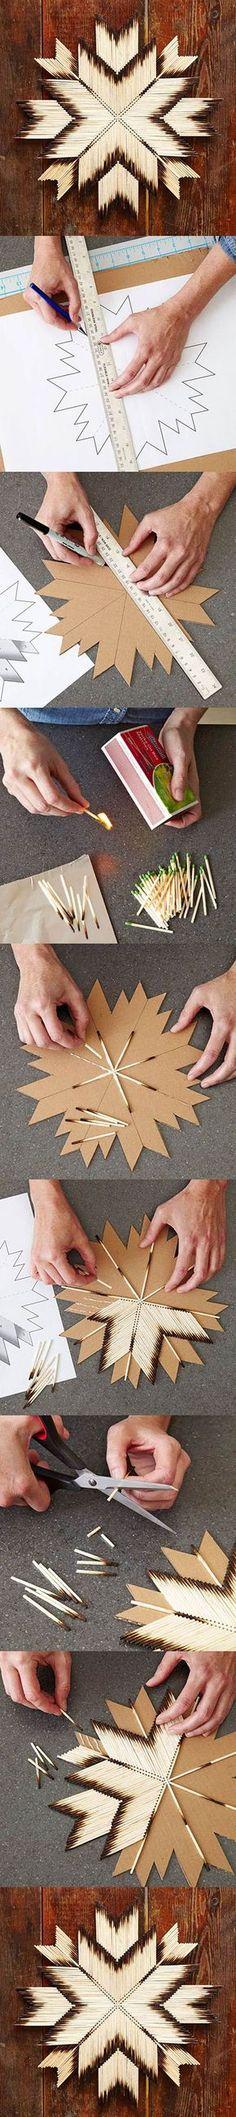 So Cool Craft | DIY & Crafts Tutorials